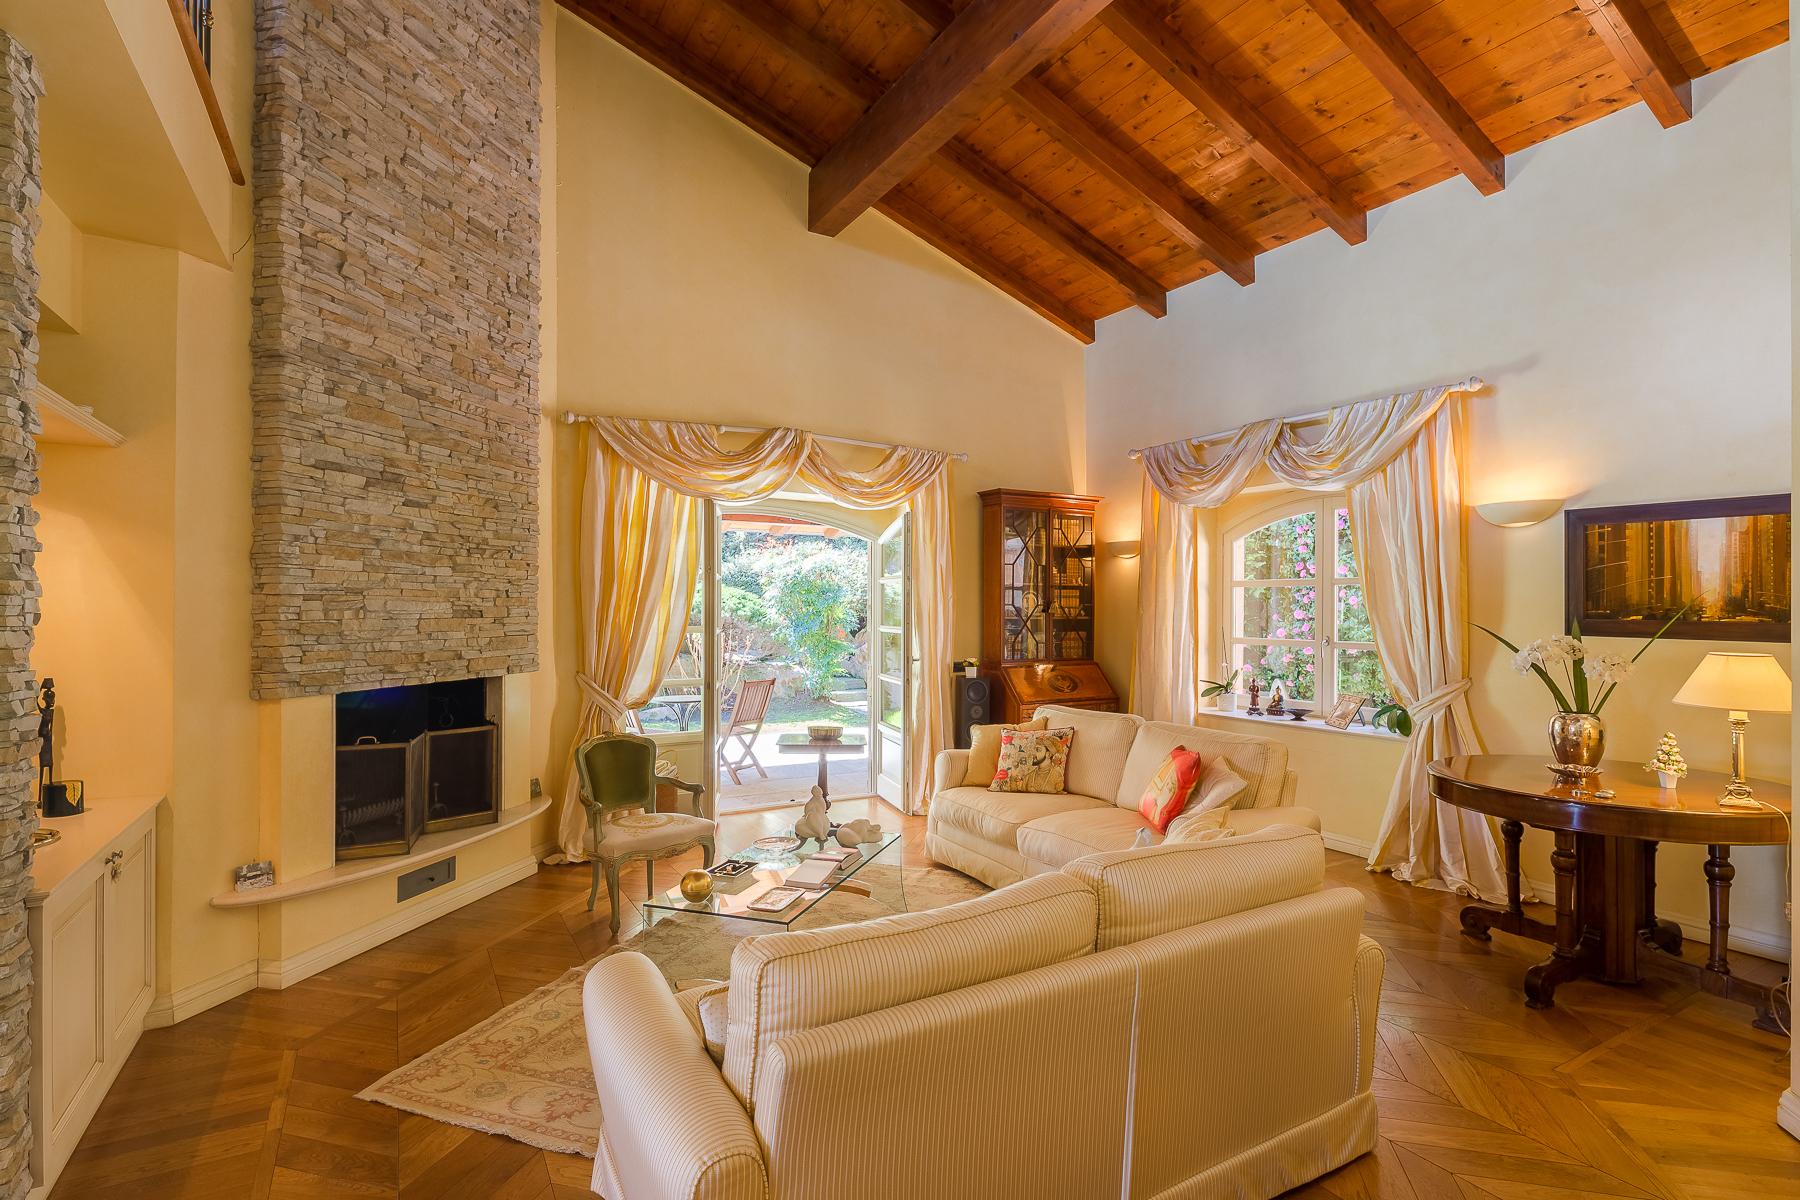 Villa in Vendita a Varese: 5 locali, 470 mq - Foto 9